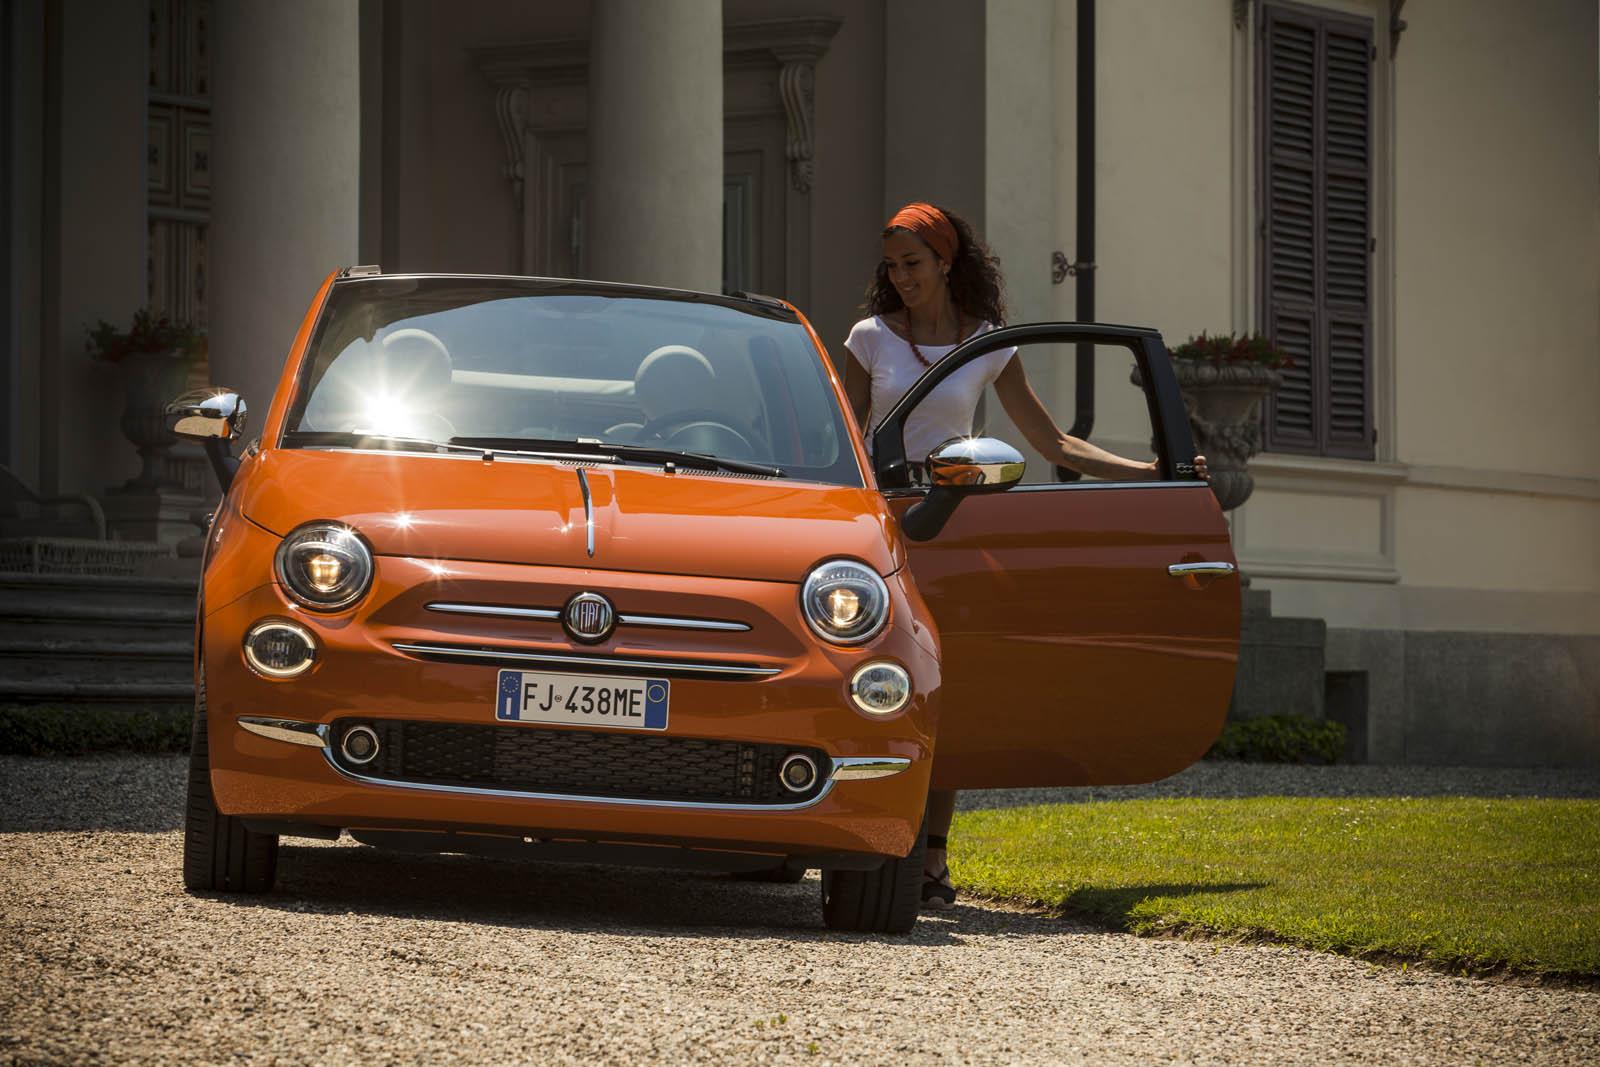 Fiat 500 Anniversario Edition (11)